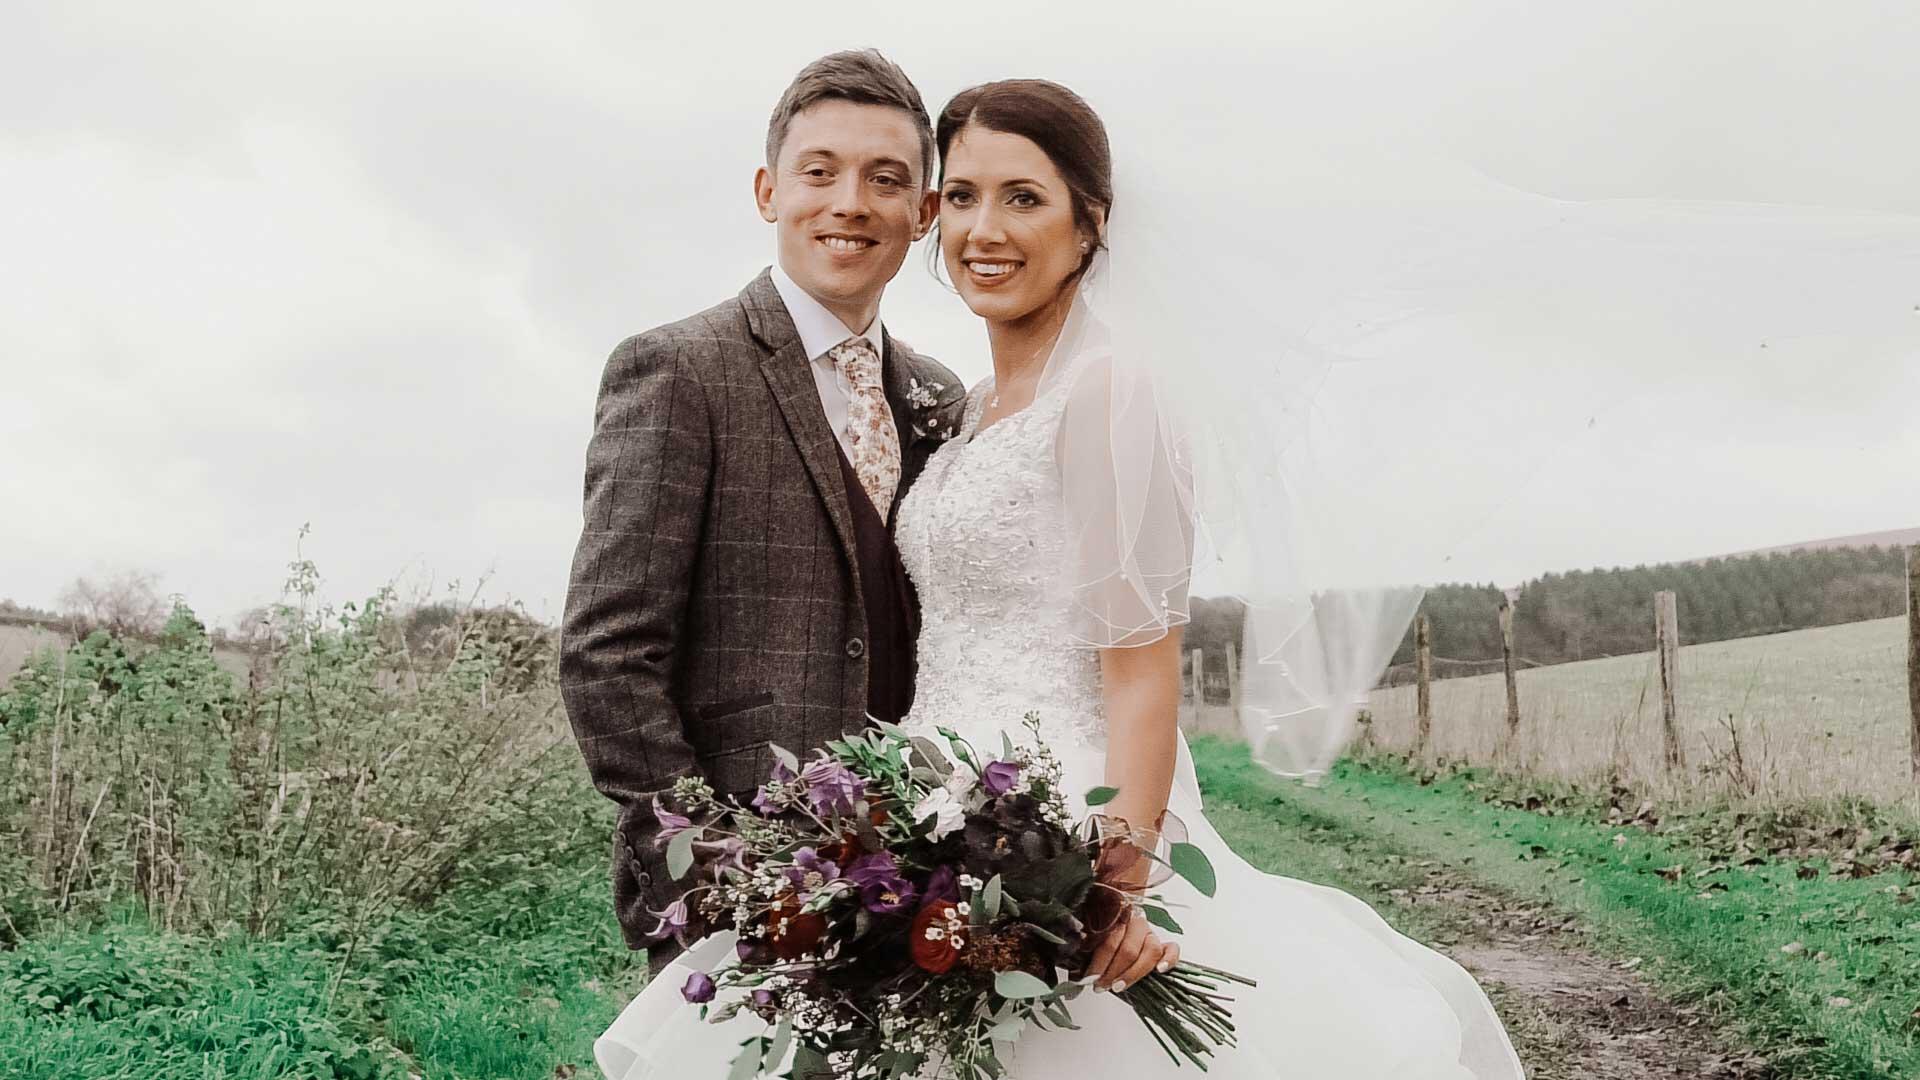 Wedding Photography Upwaltham Barns